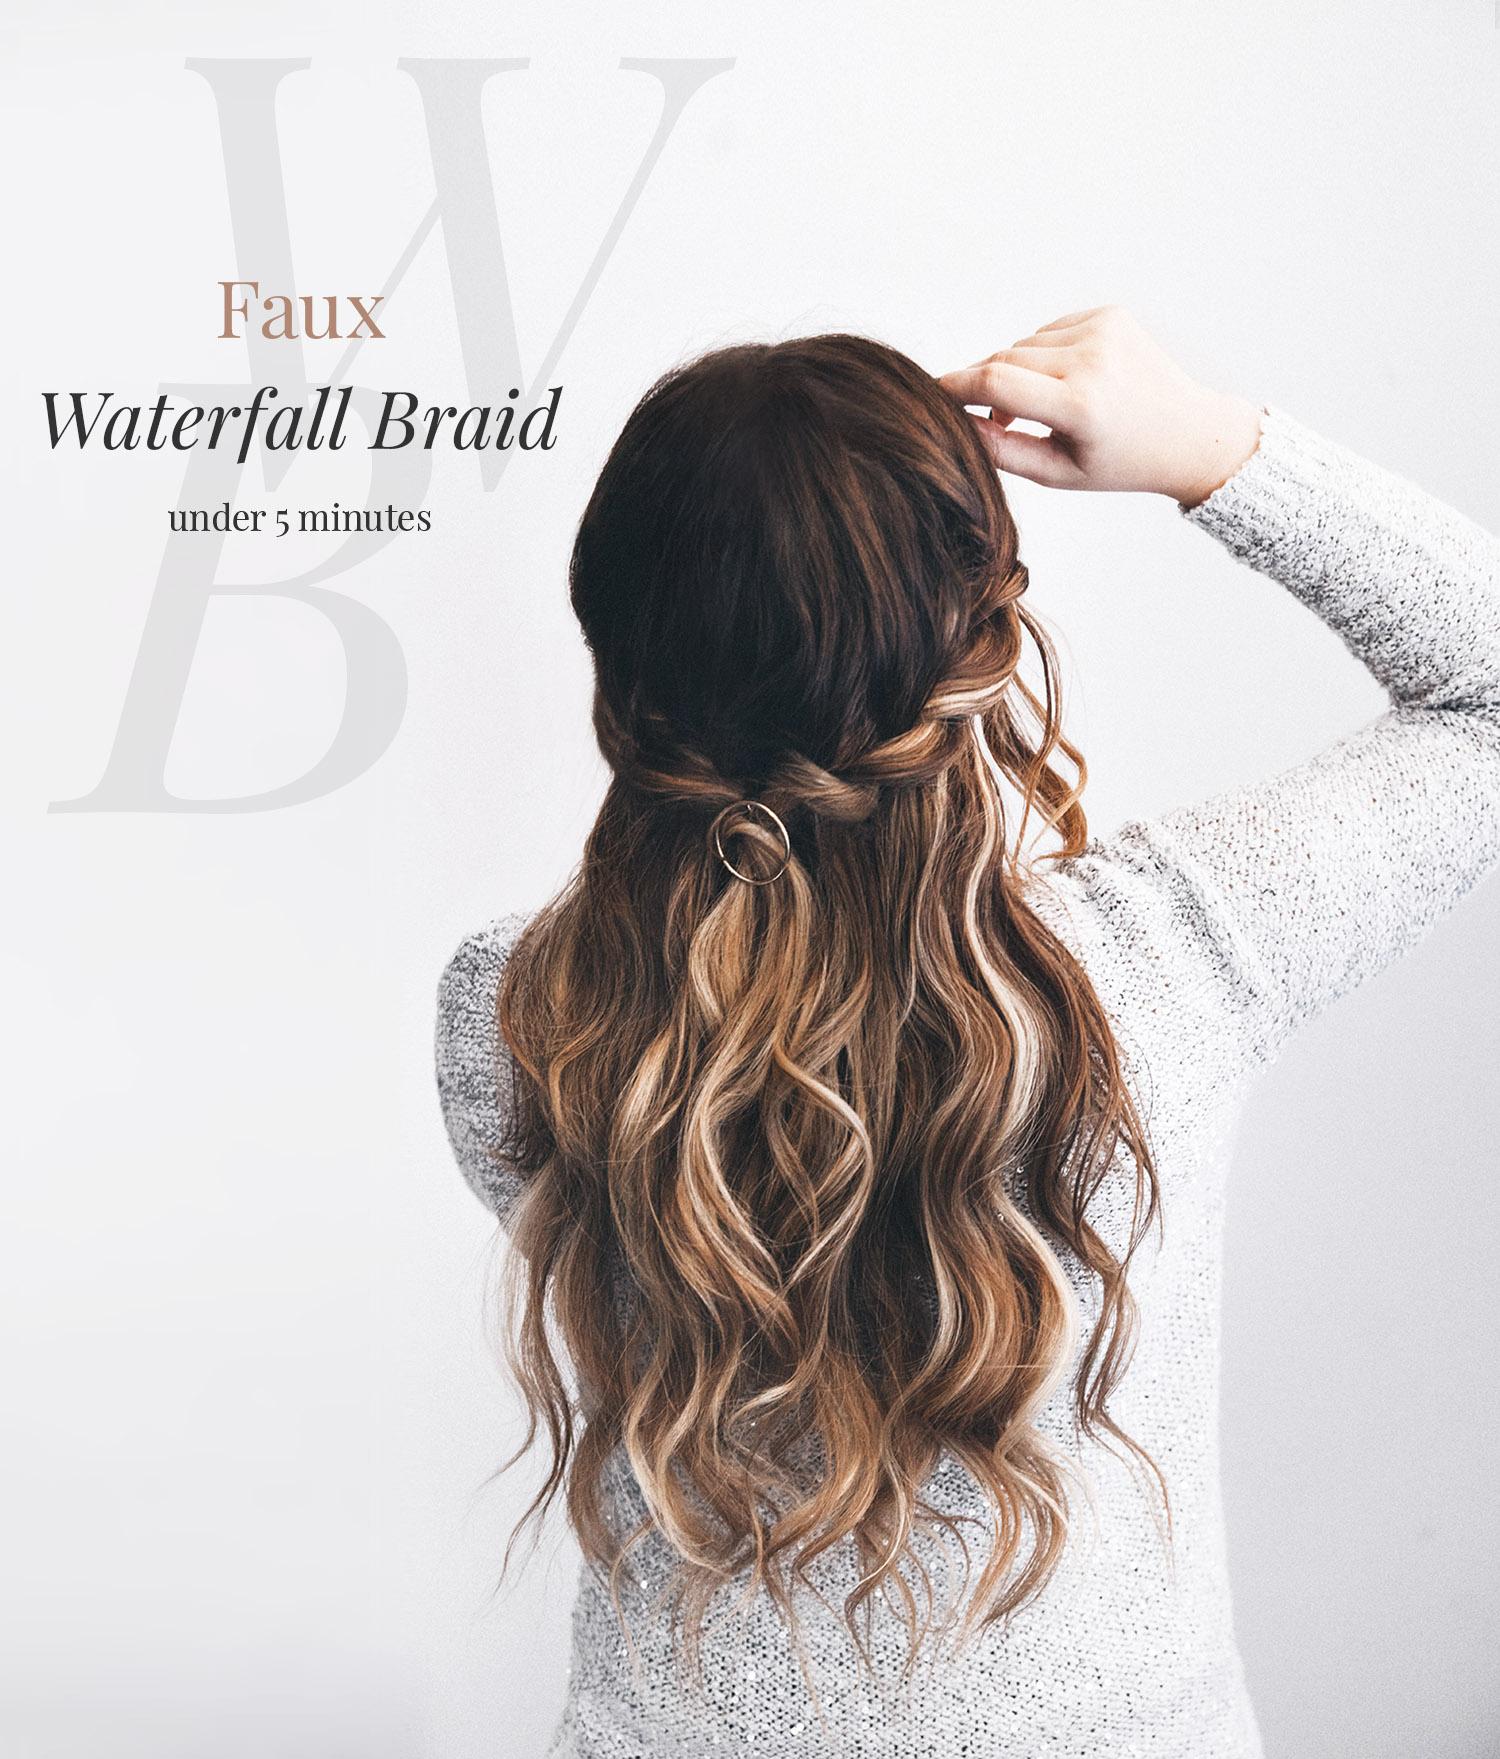 DIY: Faux Waterfall Braid Tutorial